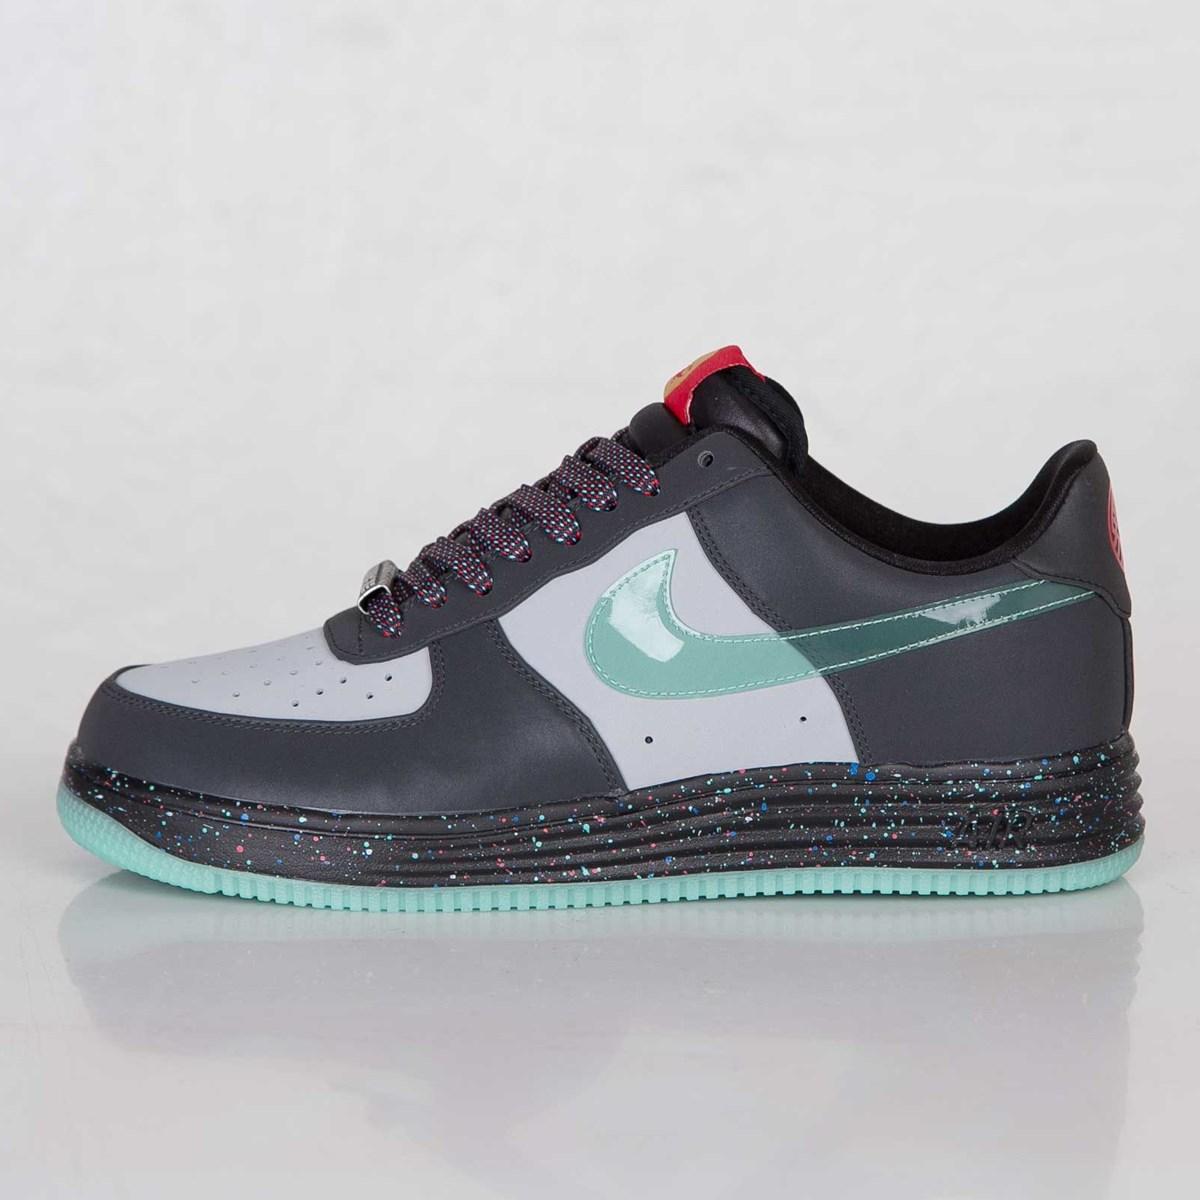 a70a3b243f3e Nike Lunar Force 1 YOH QS - 647595-001 - Sneakersnstuff